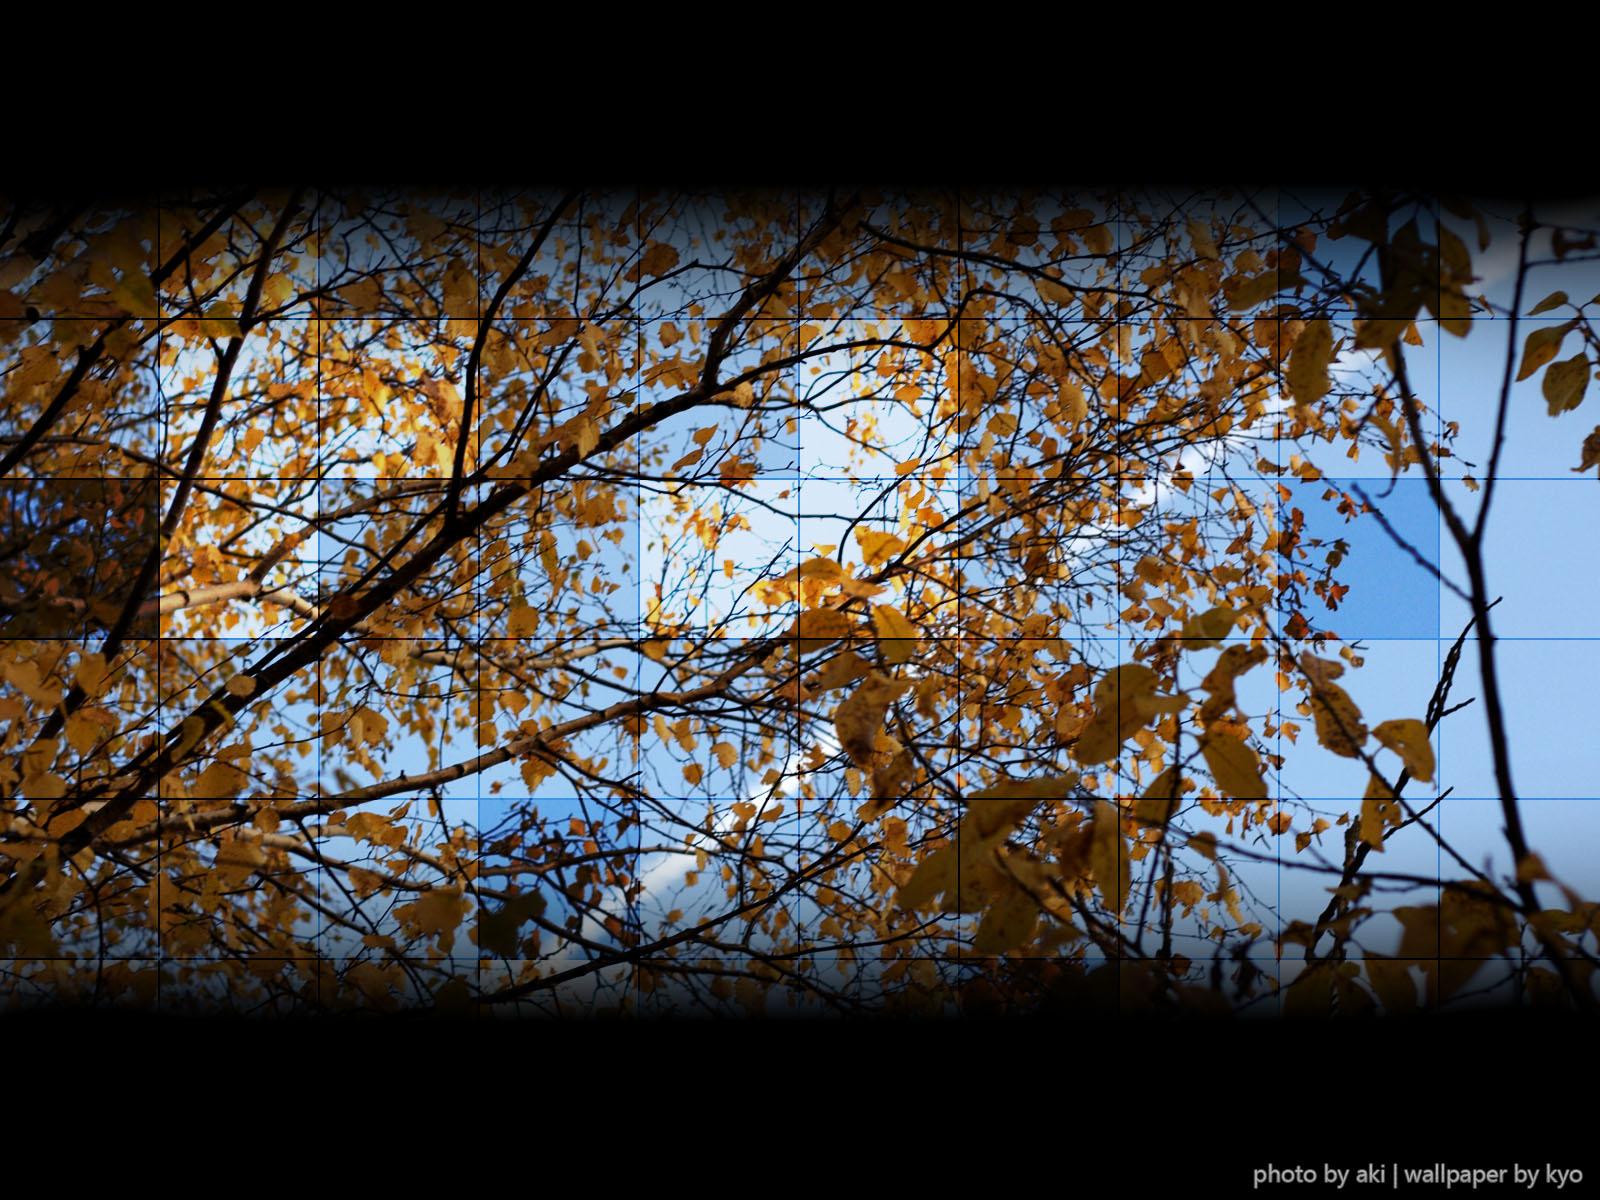 mosaic_sky_by_hiraku_makimura.jpg